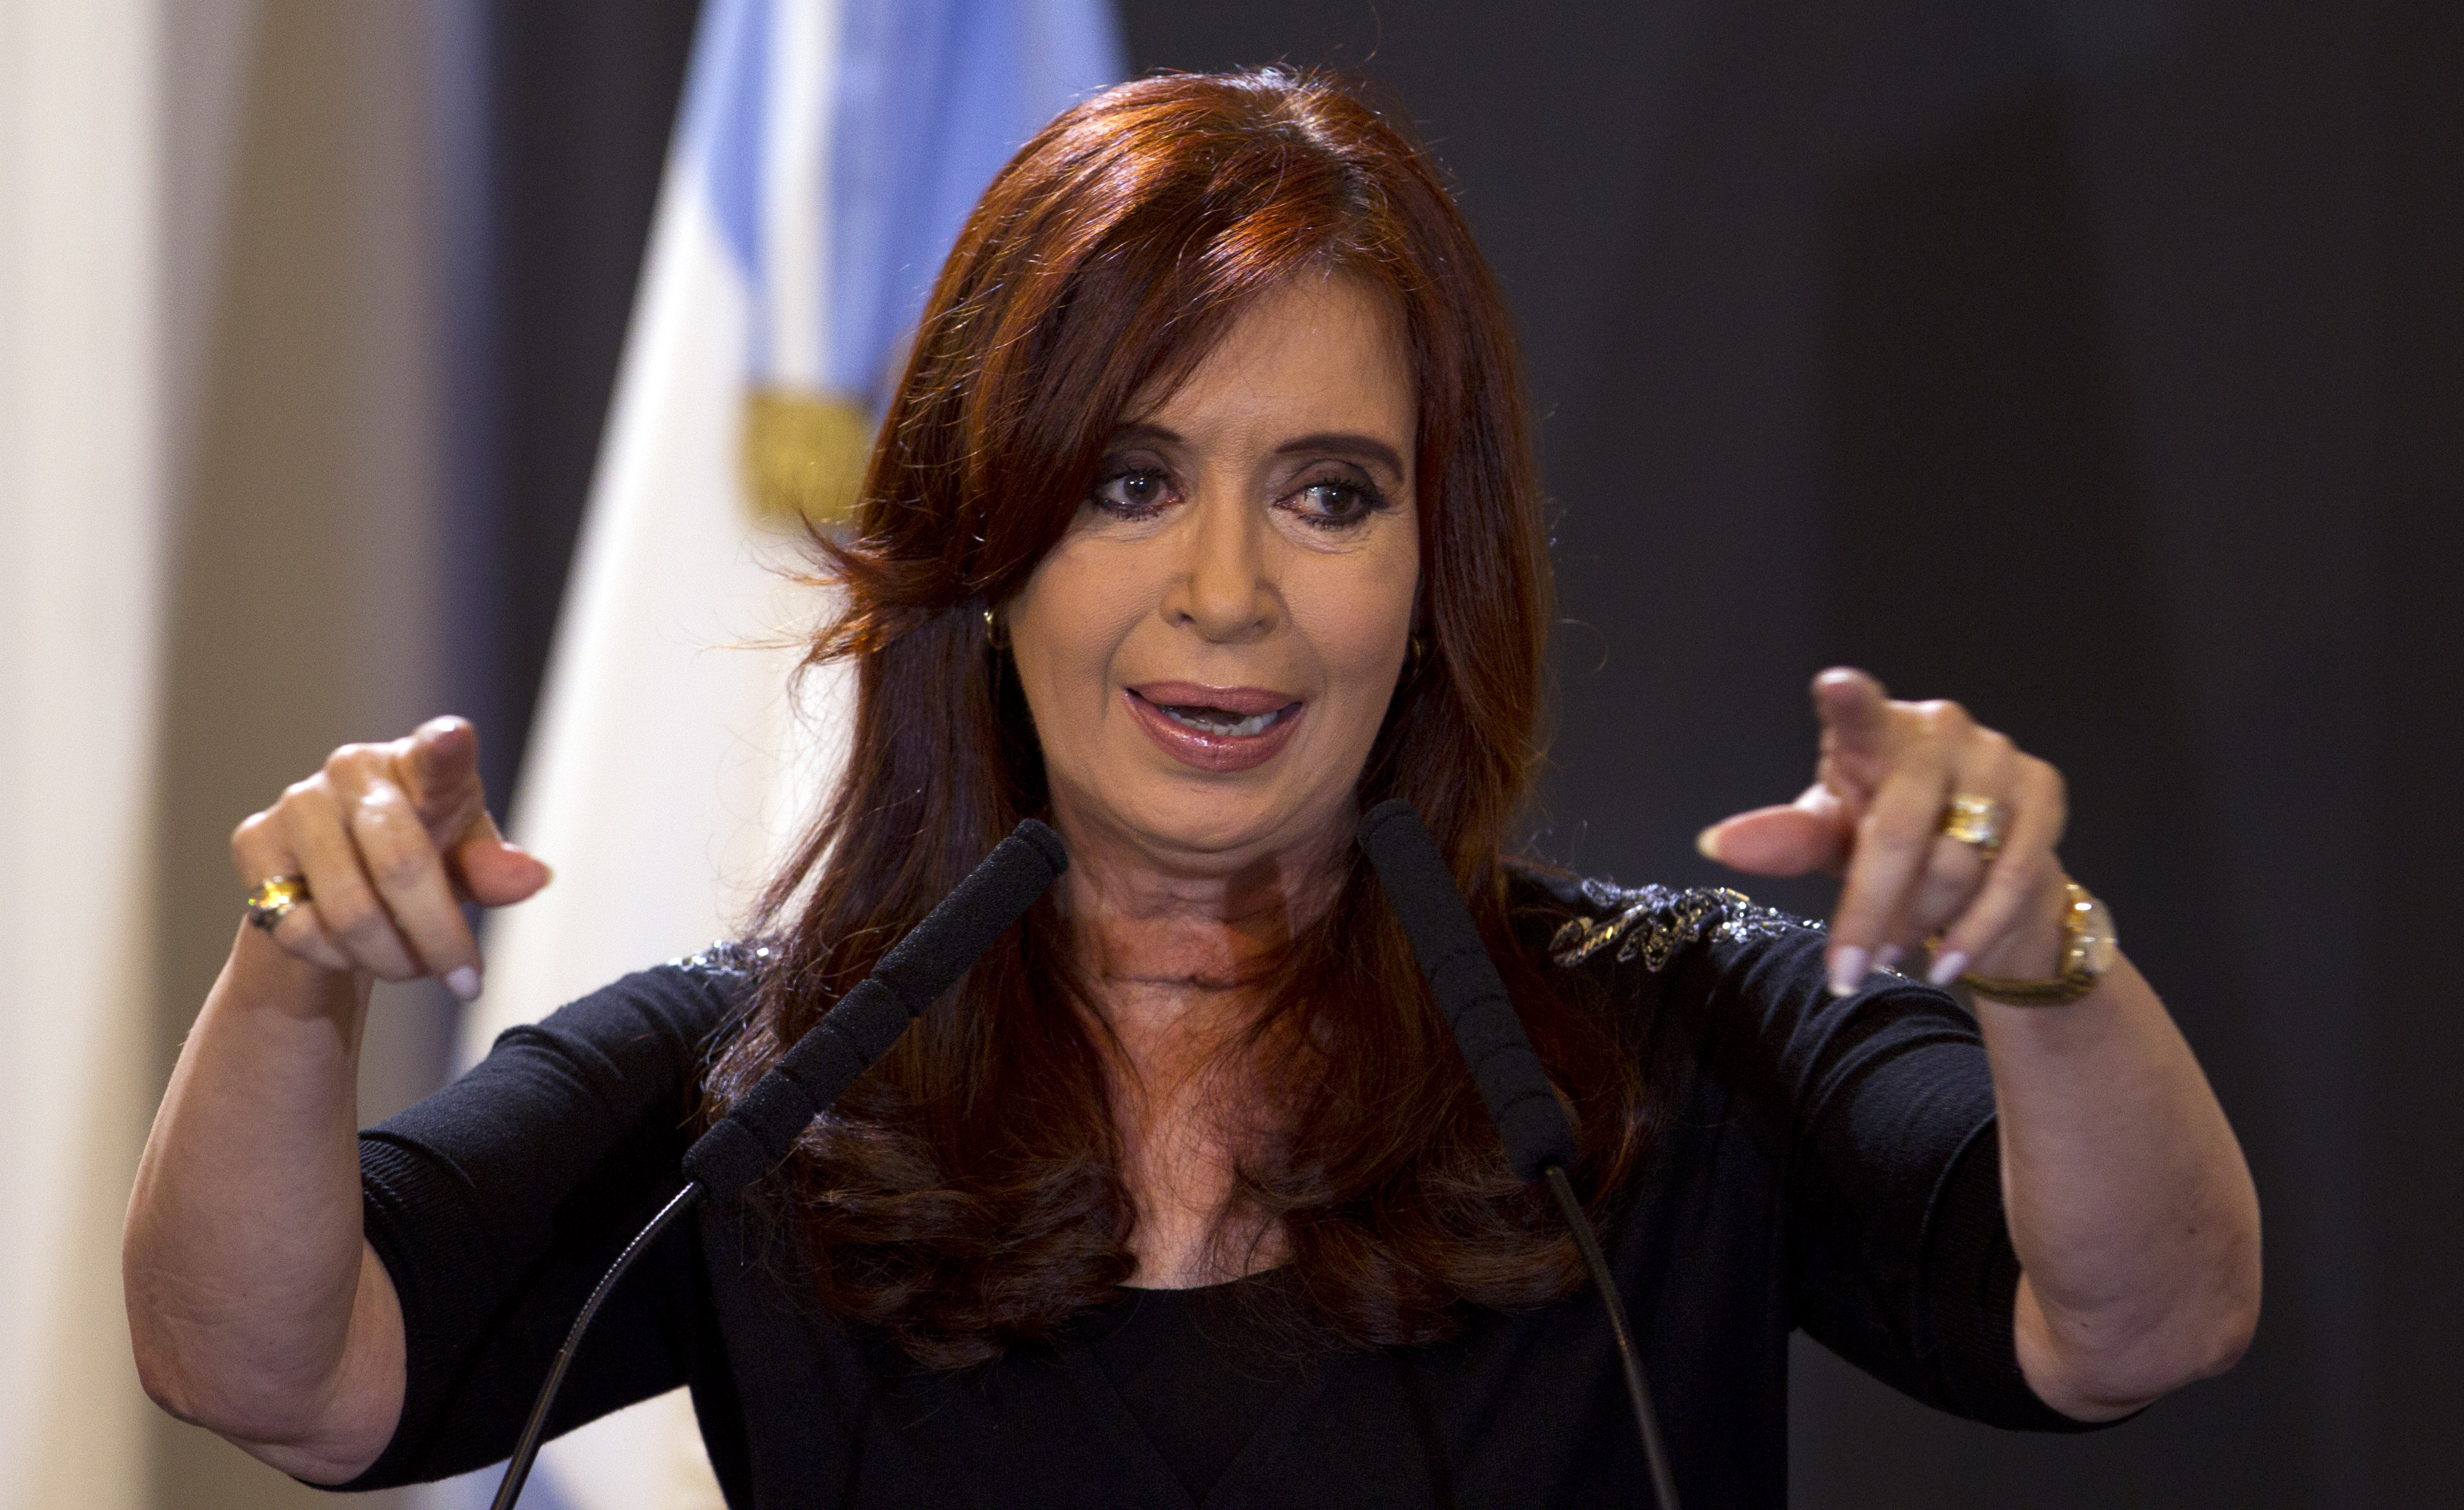 Argentina Fernandez